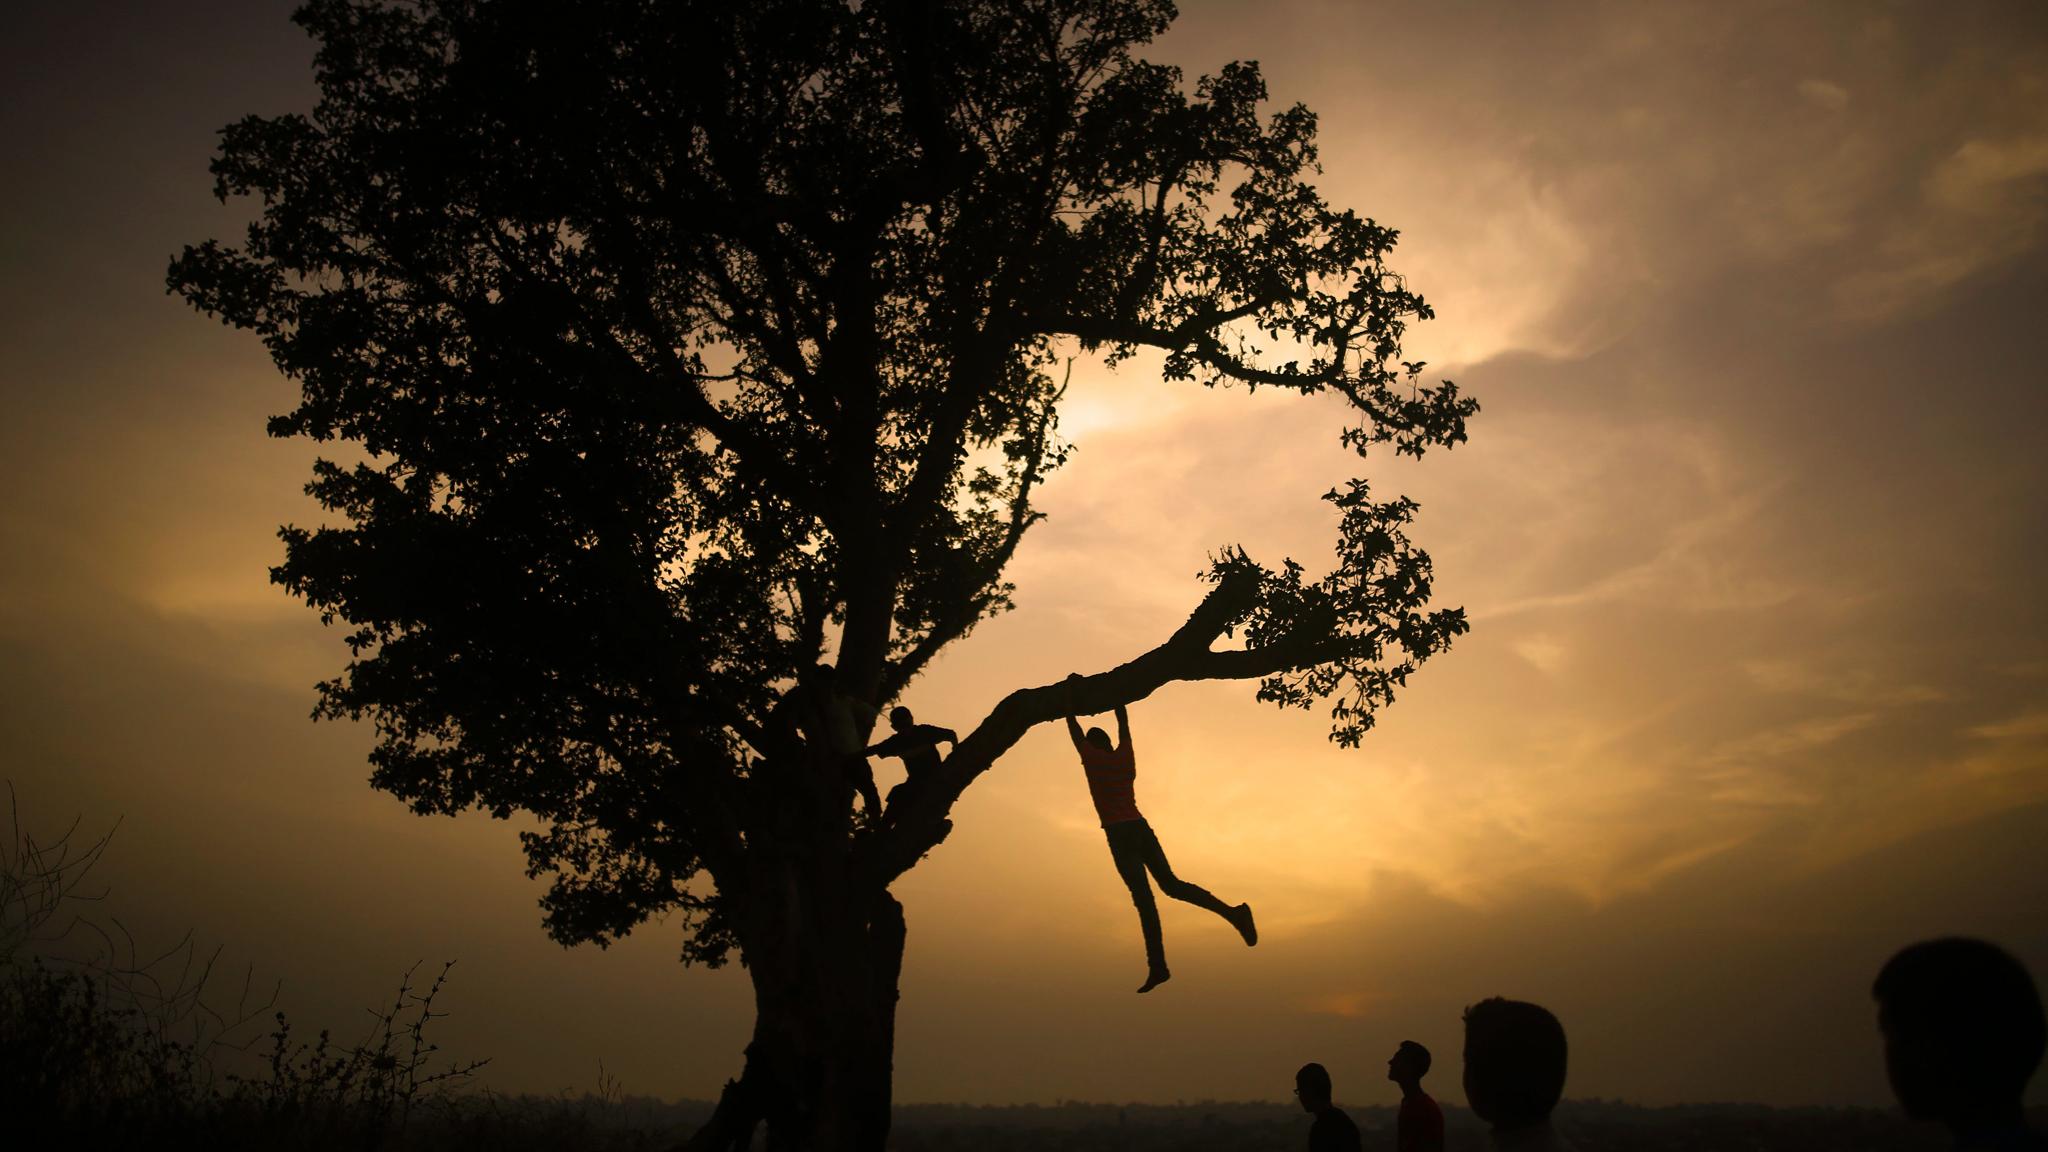 Children play at Jabalia refugee camp | Financial Times